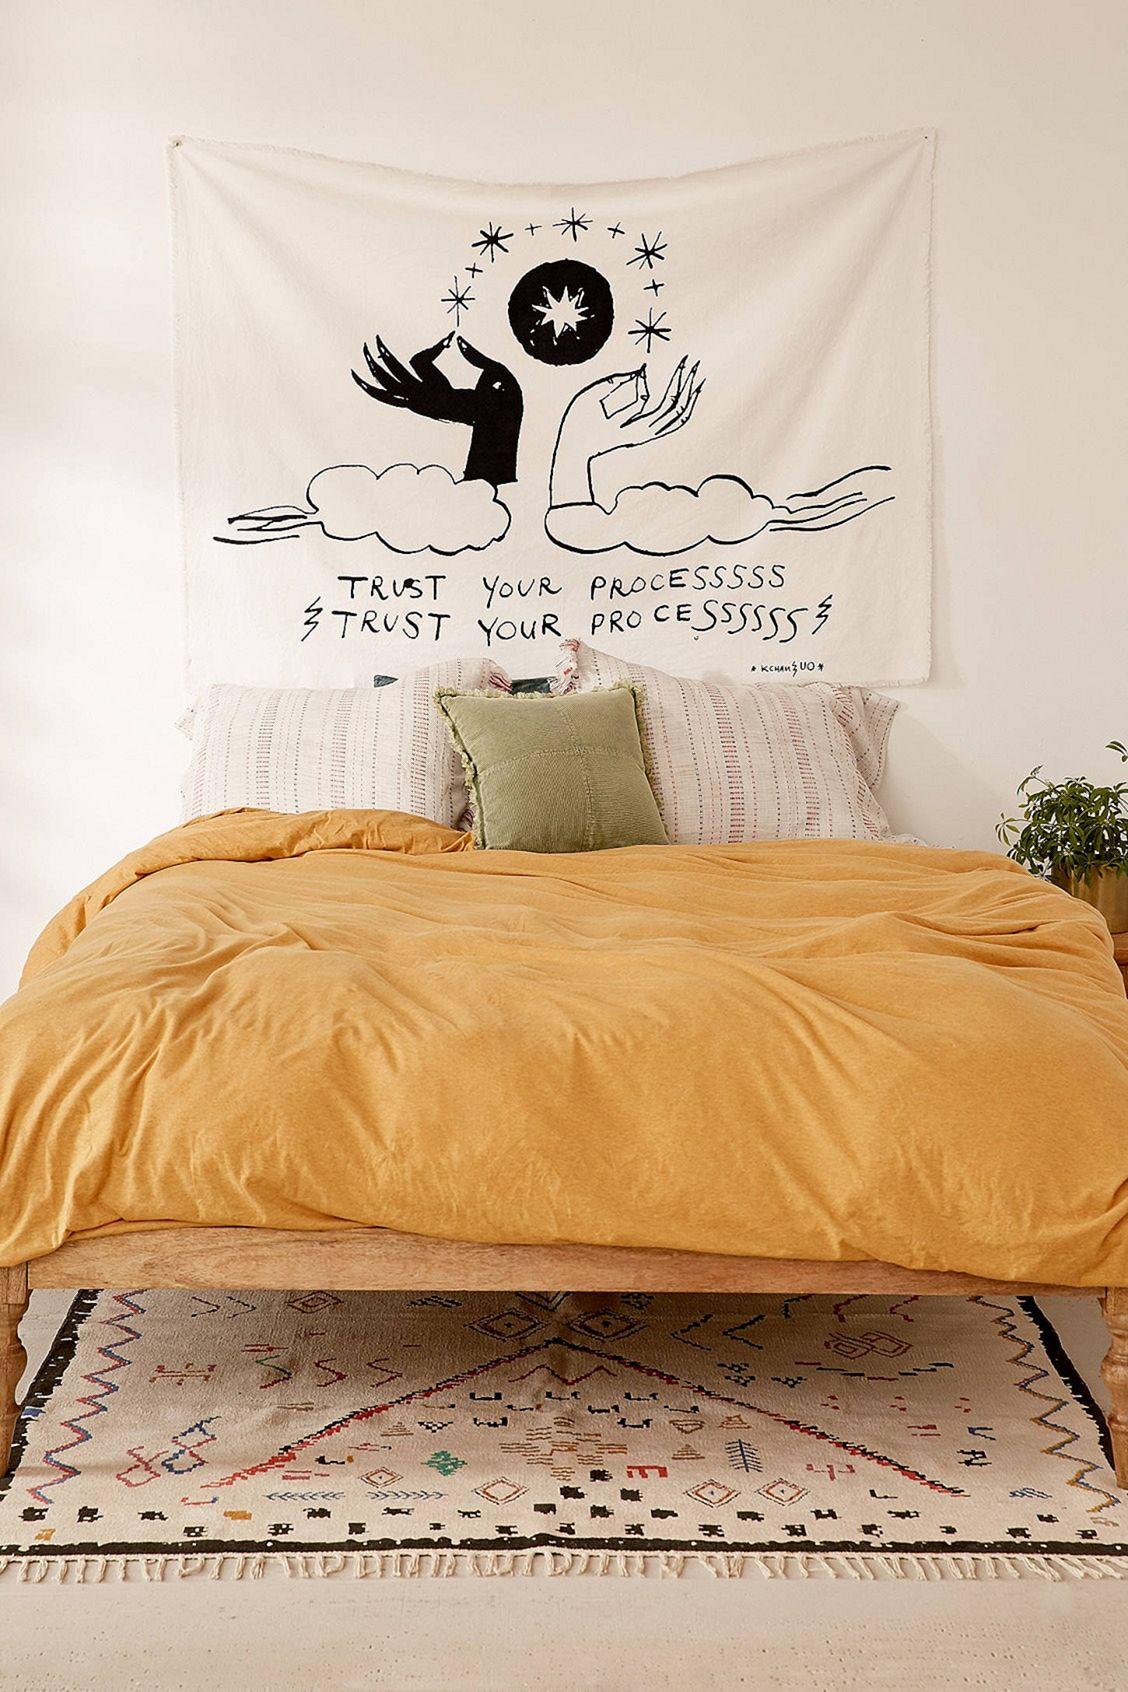 Incredible Yellow Aesthetic Bedroom Decorating Ideas 24 Decoredo